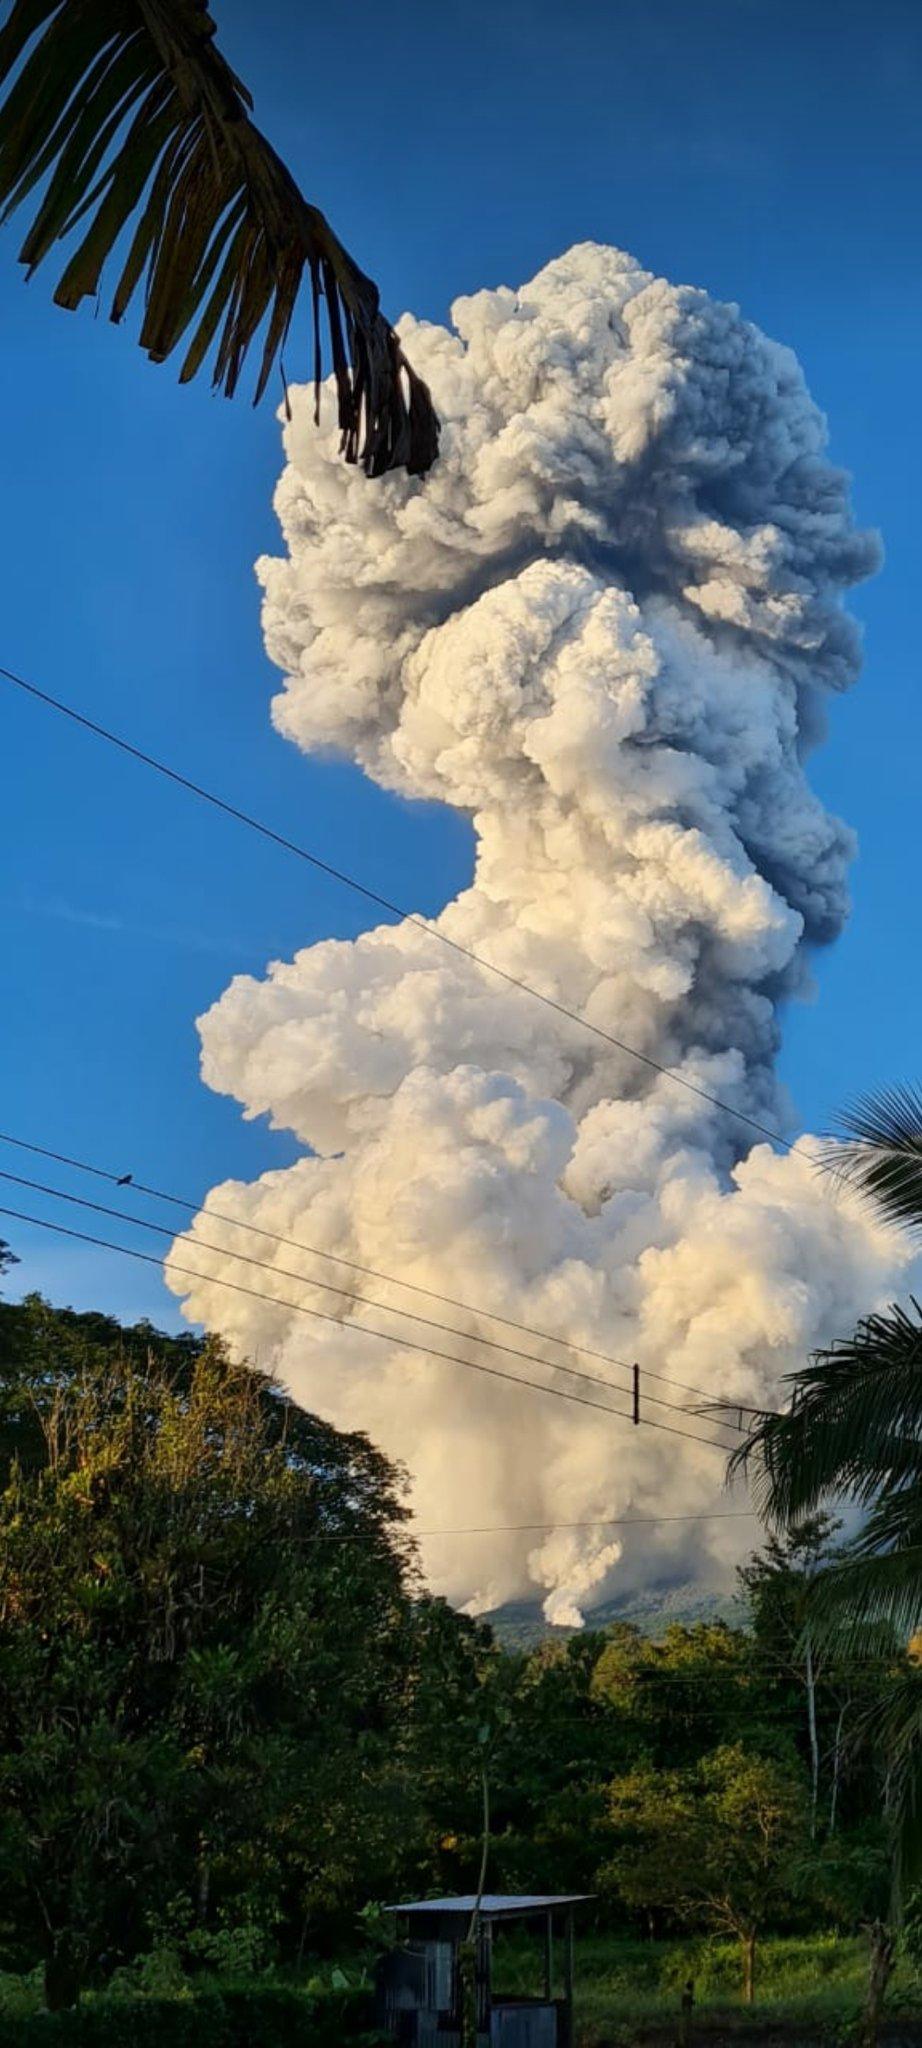 Strong phreatic explosion from Rincon de la Vieja volcano this morning (image: @GuigniBen/twitter)